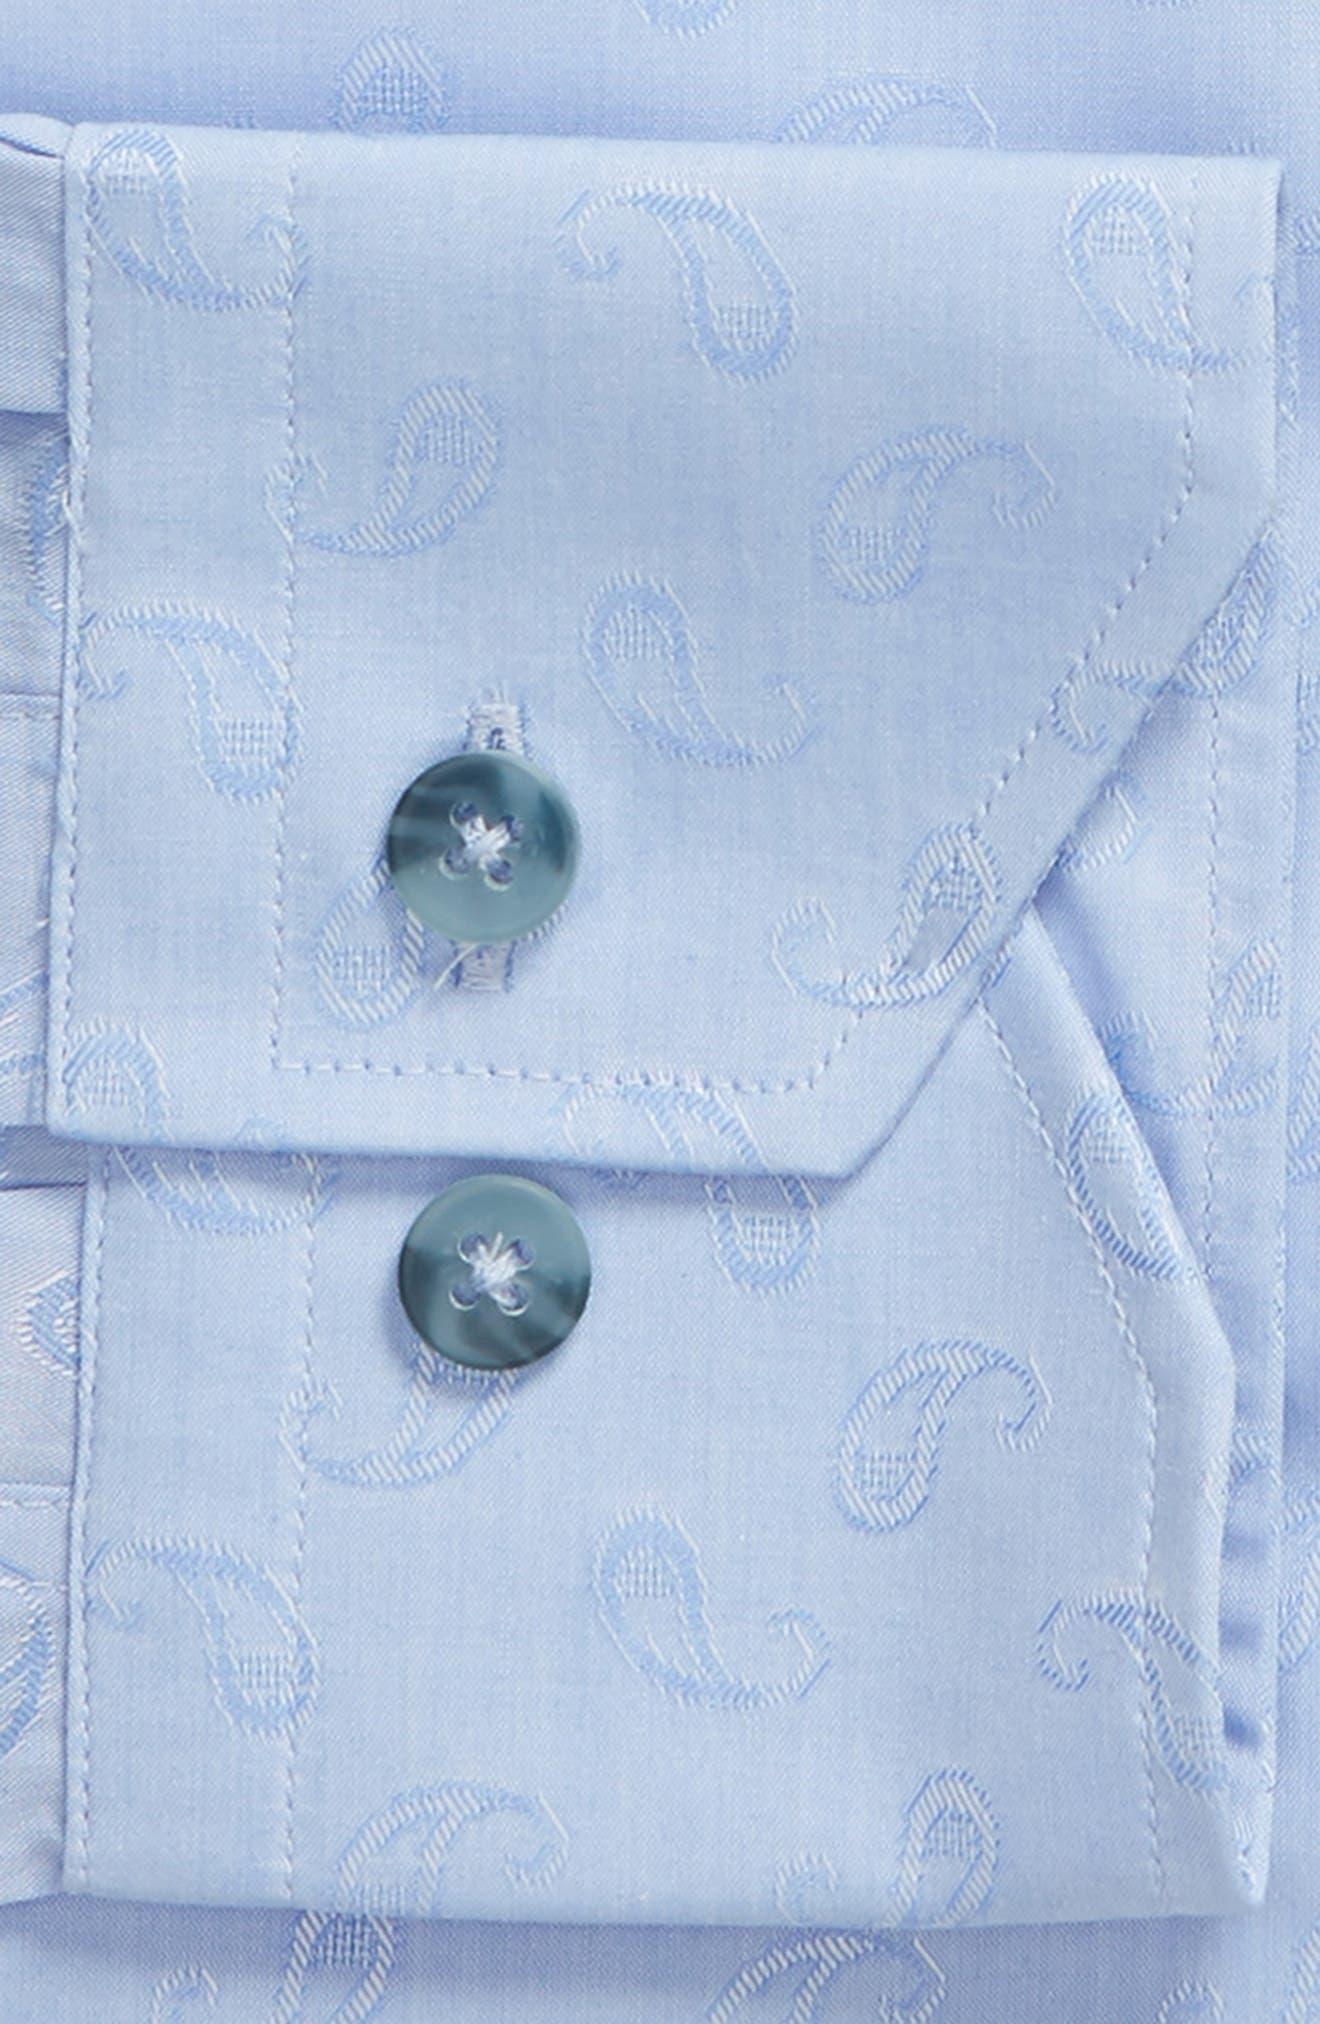 Trim Fit Paisley Dress Shirt,                             Alternate thumbnail 6, color,                             LIGHT BLUE